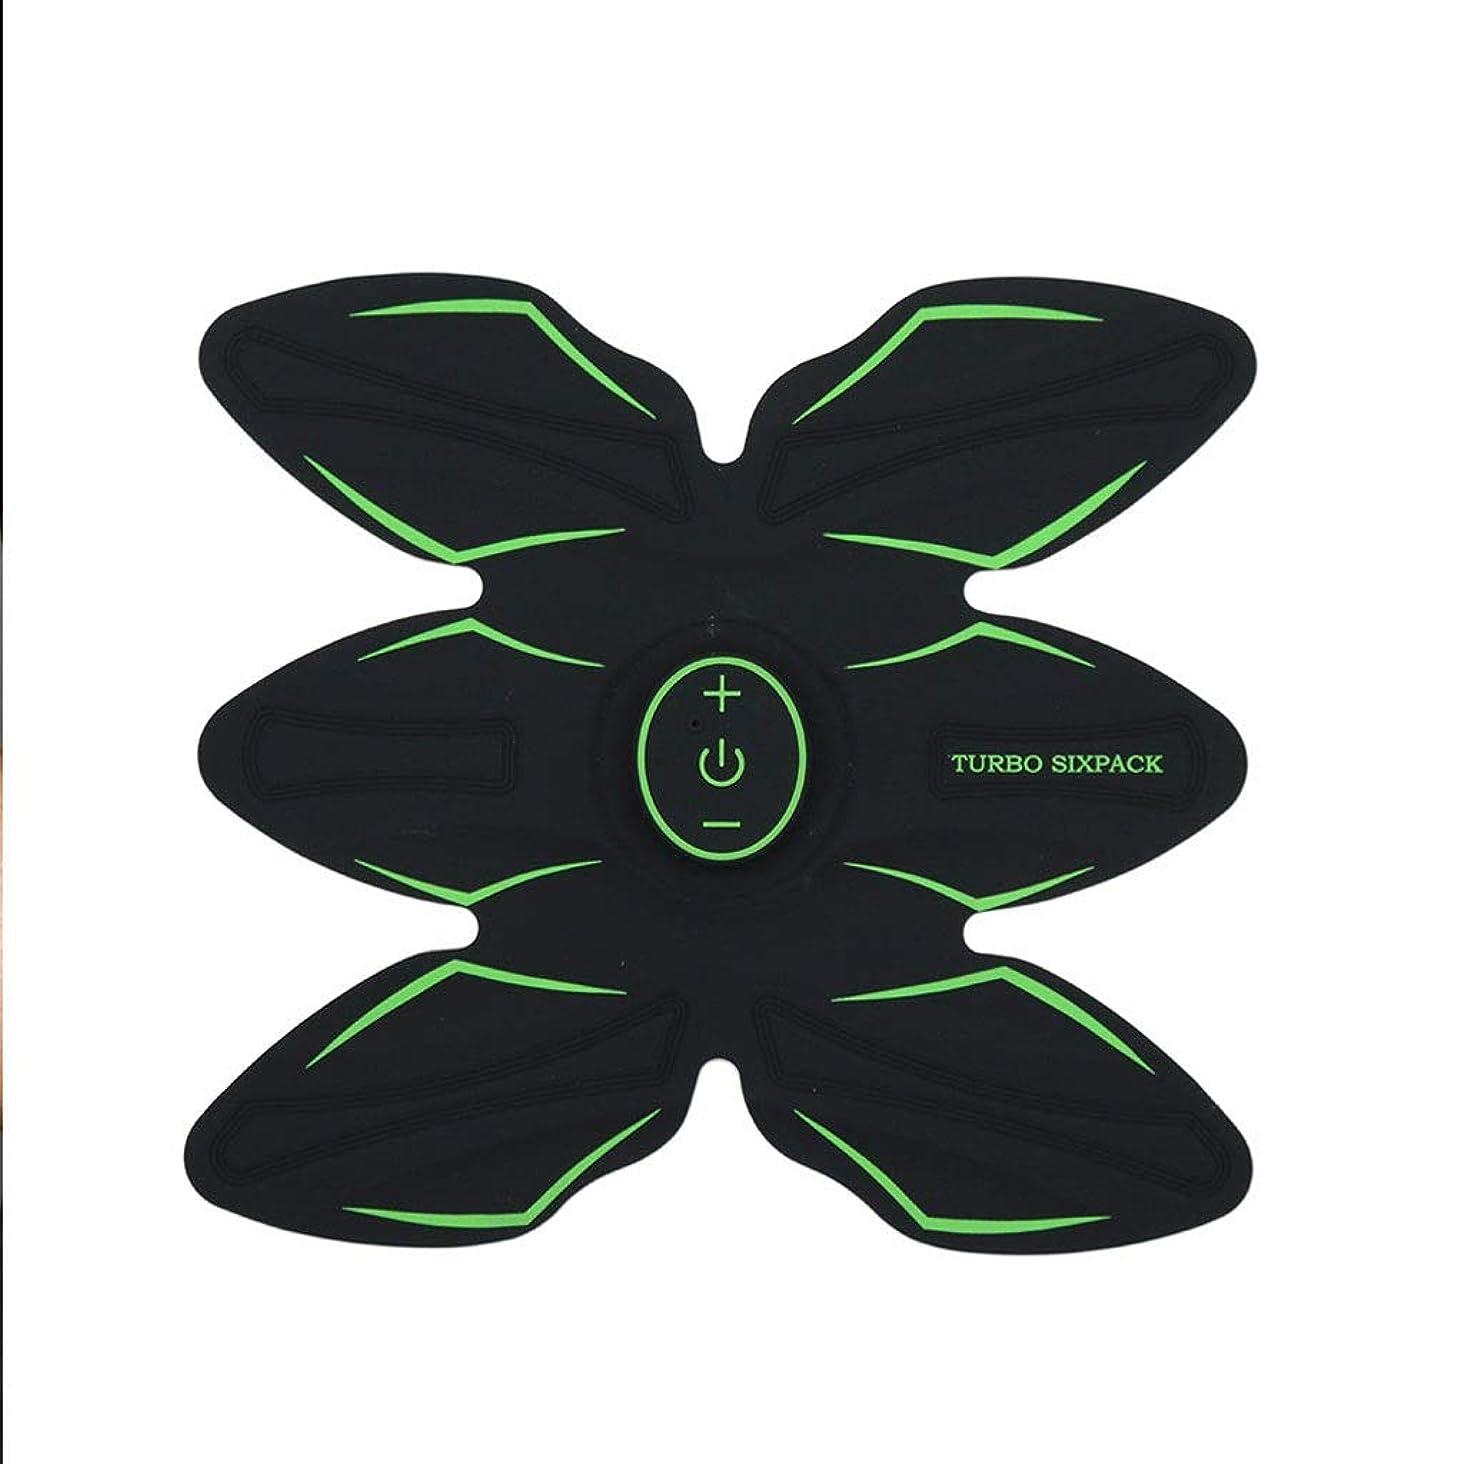 ABSトレーナーEMS腹部電気筋肉刺激装置筋肉トナー調色ベルトフィットネスギアABSエクササイズマシンウエストトレーナーホームワークアウトフィットネス機器